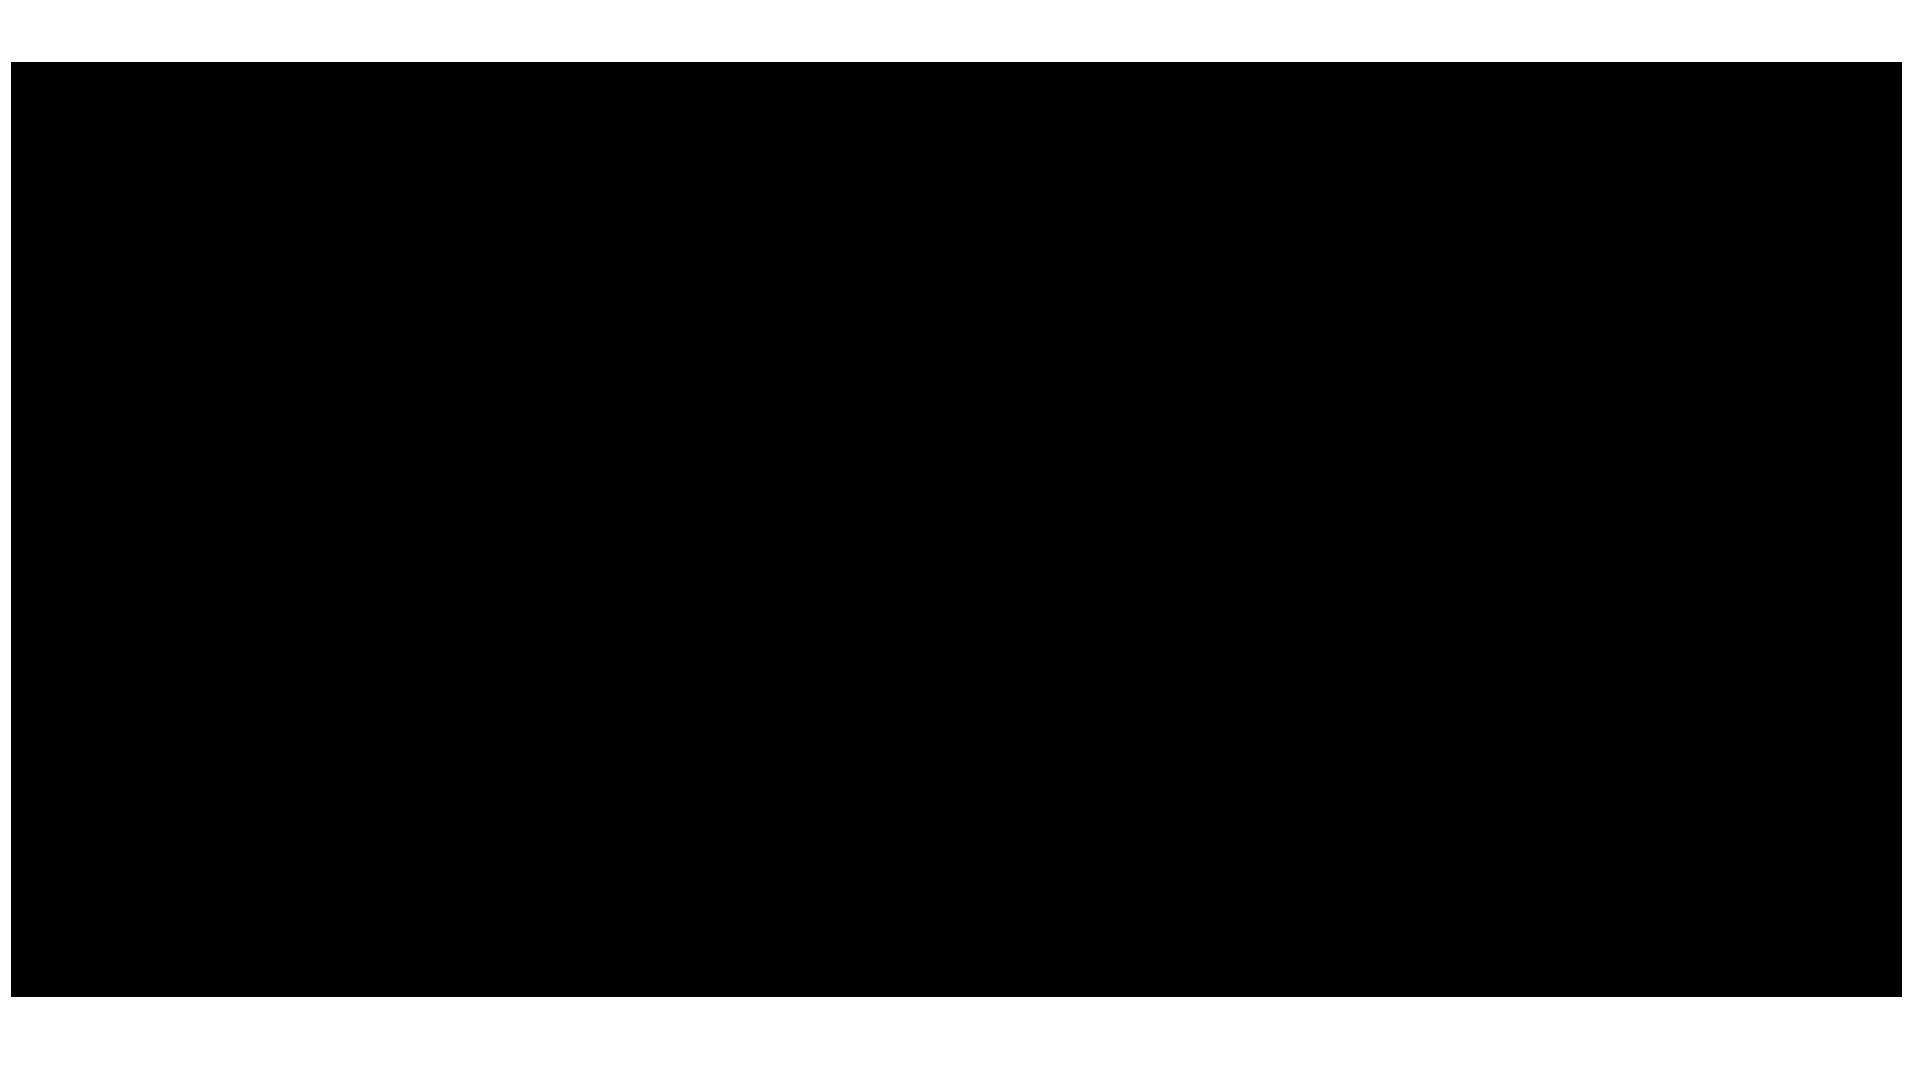 Valentina Semeraro Logopedia - Slide home trasparente